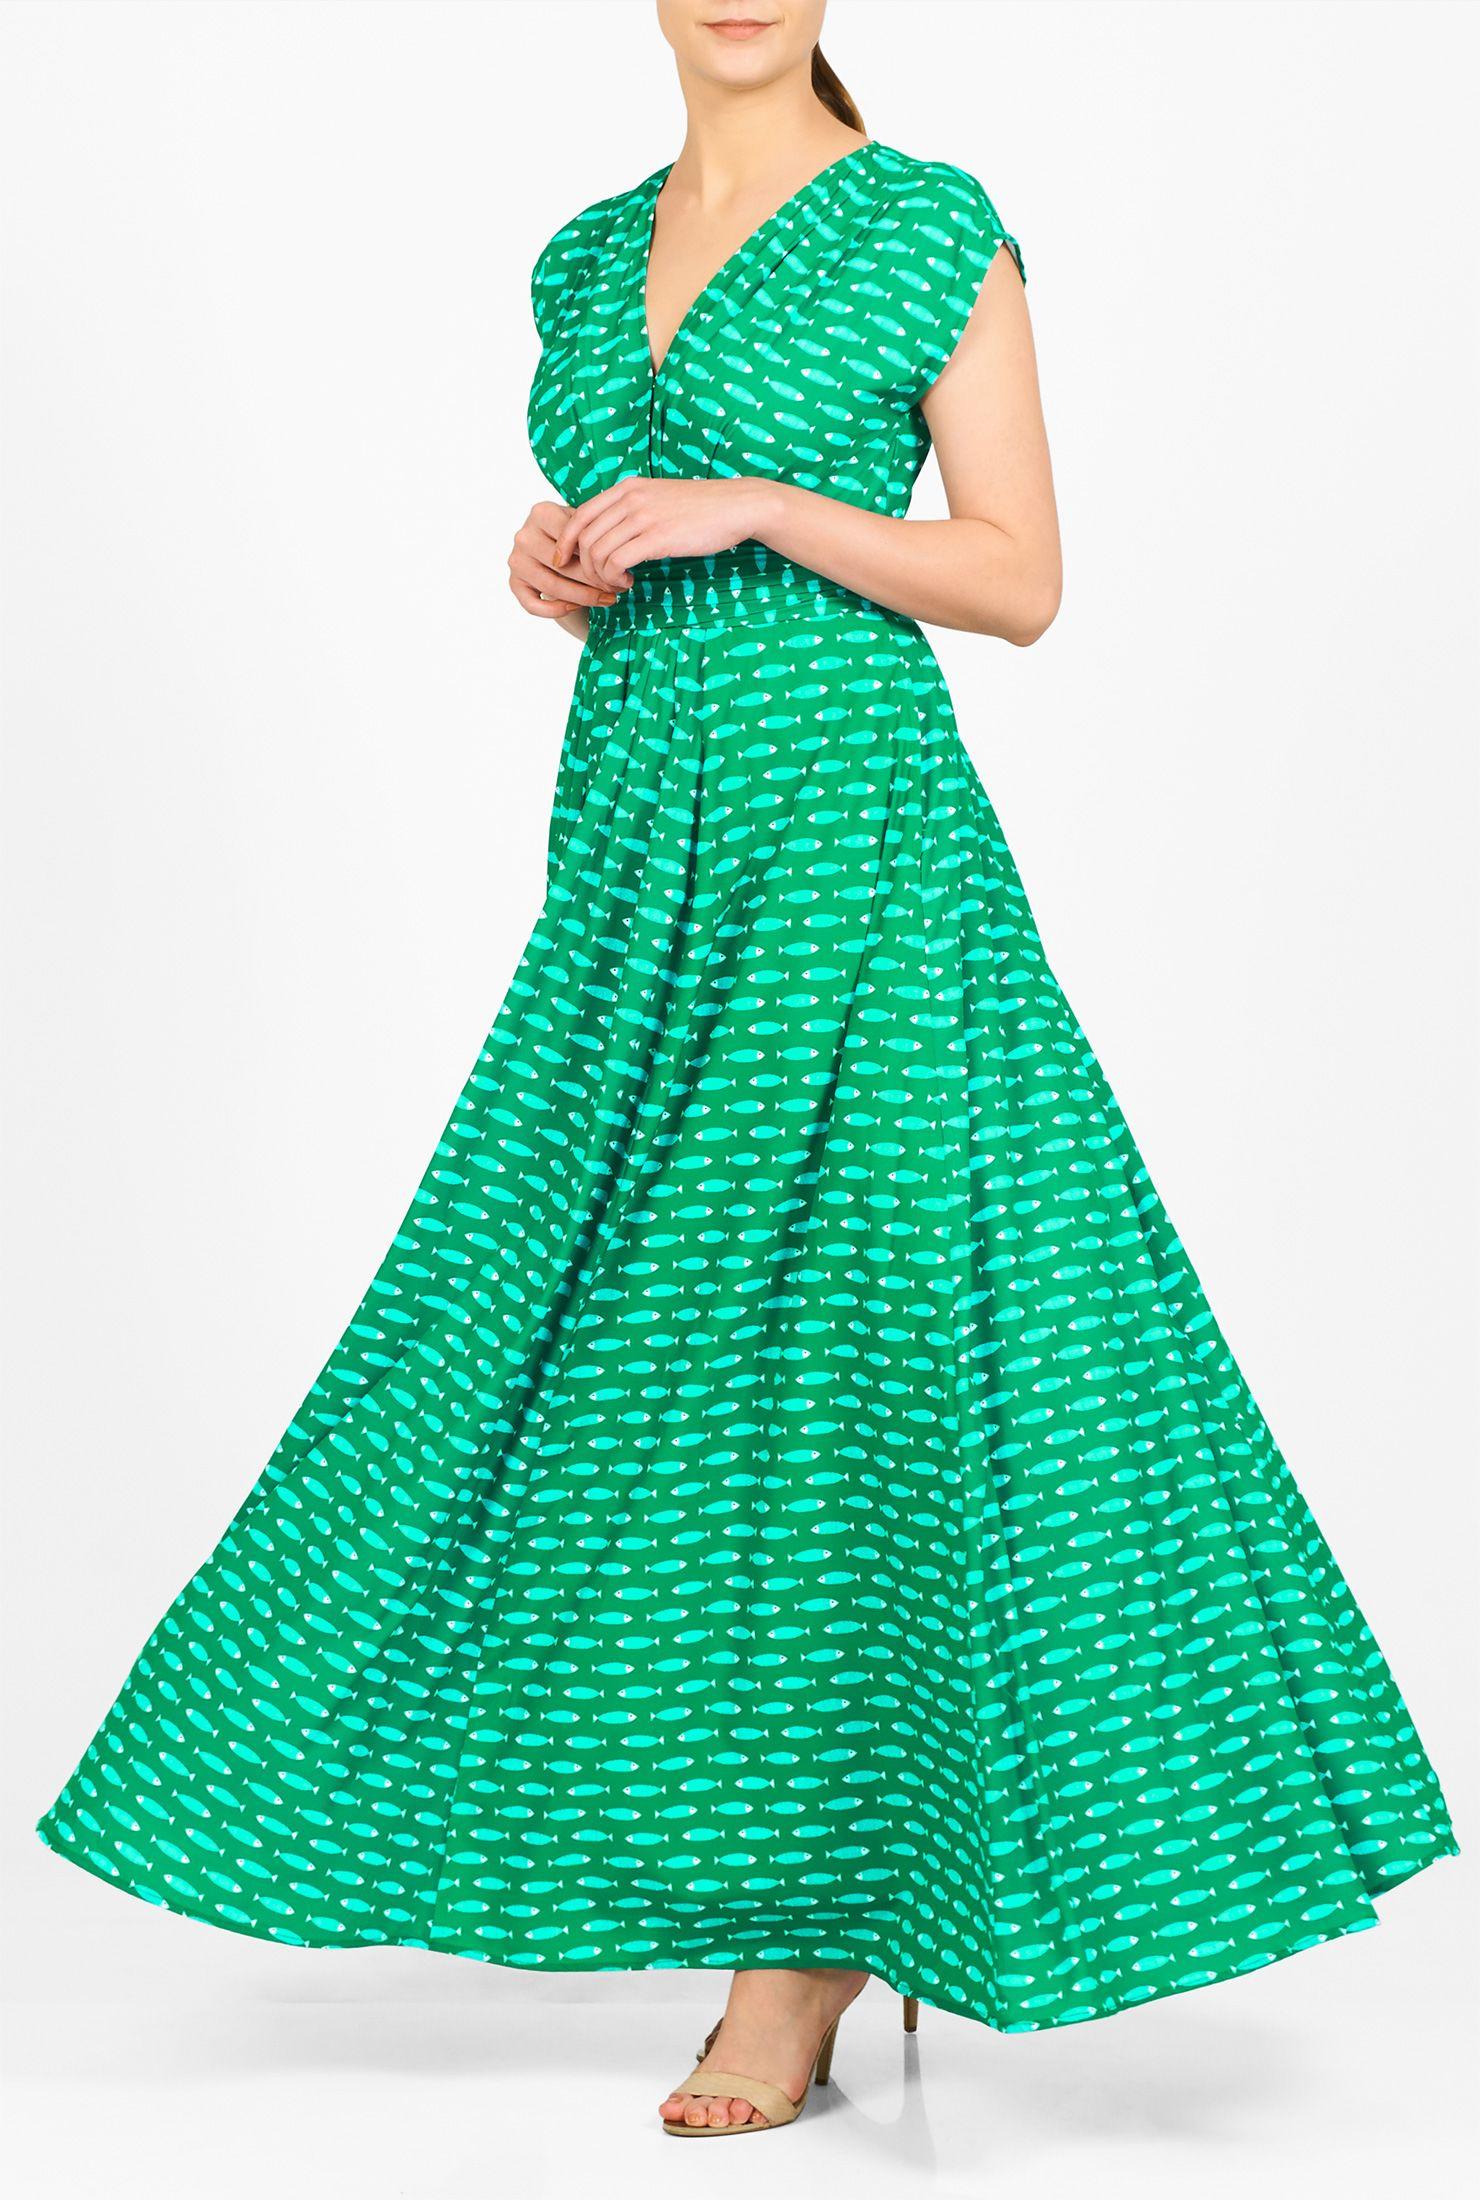 Fish Print Crepe Surplice Maxi Dress Maxi Dress Dresses Fashion Clothes Women [ 2200 x 1480 Pixel ]